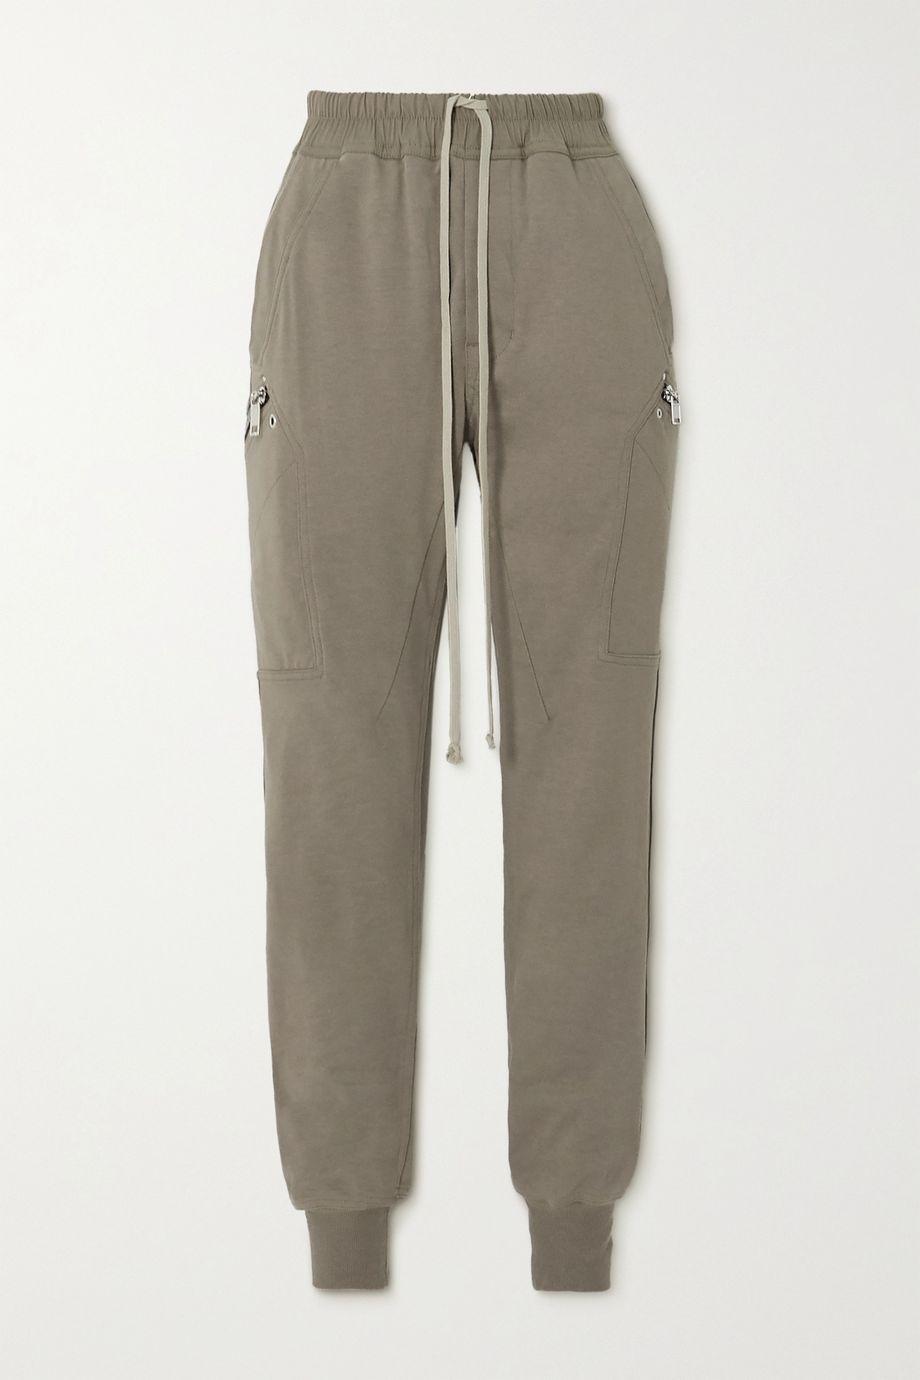 Rick Owens Stretch-cotton jersey track pants